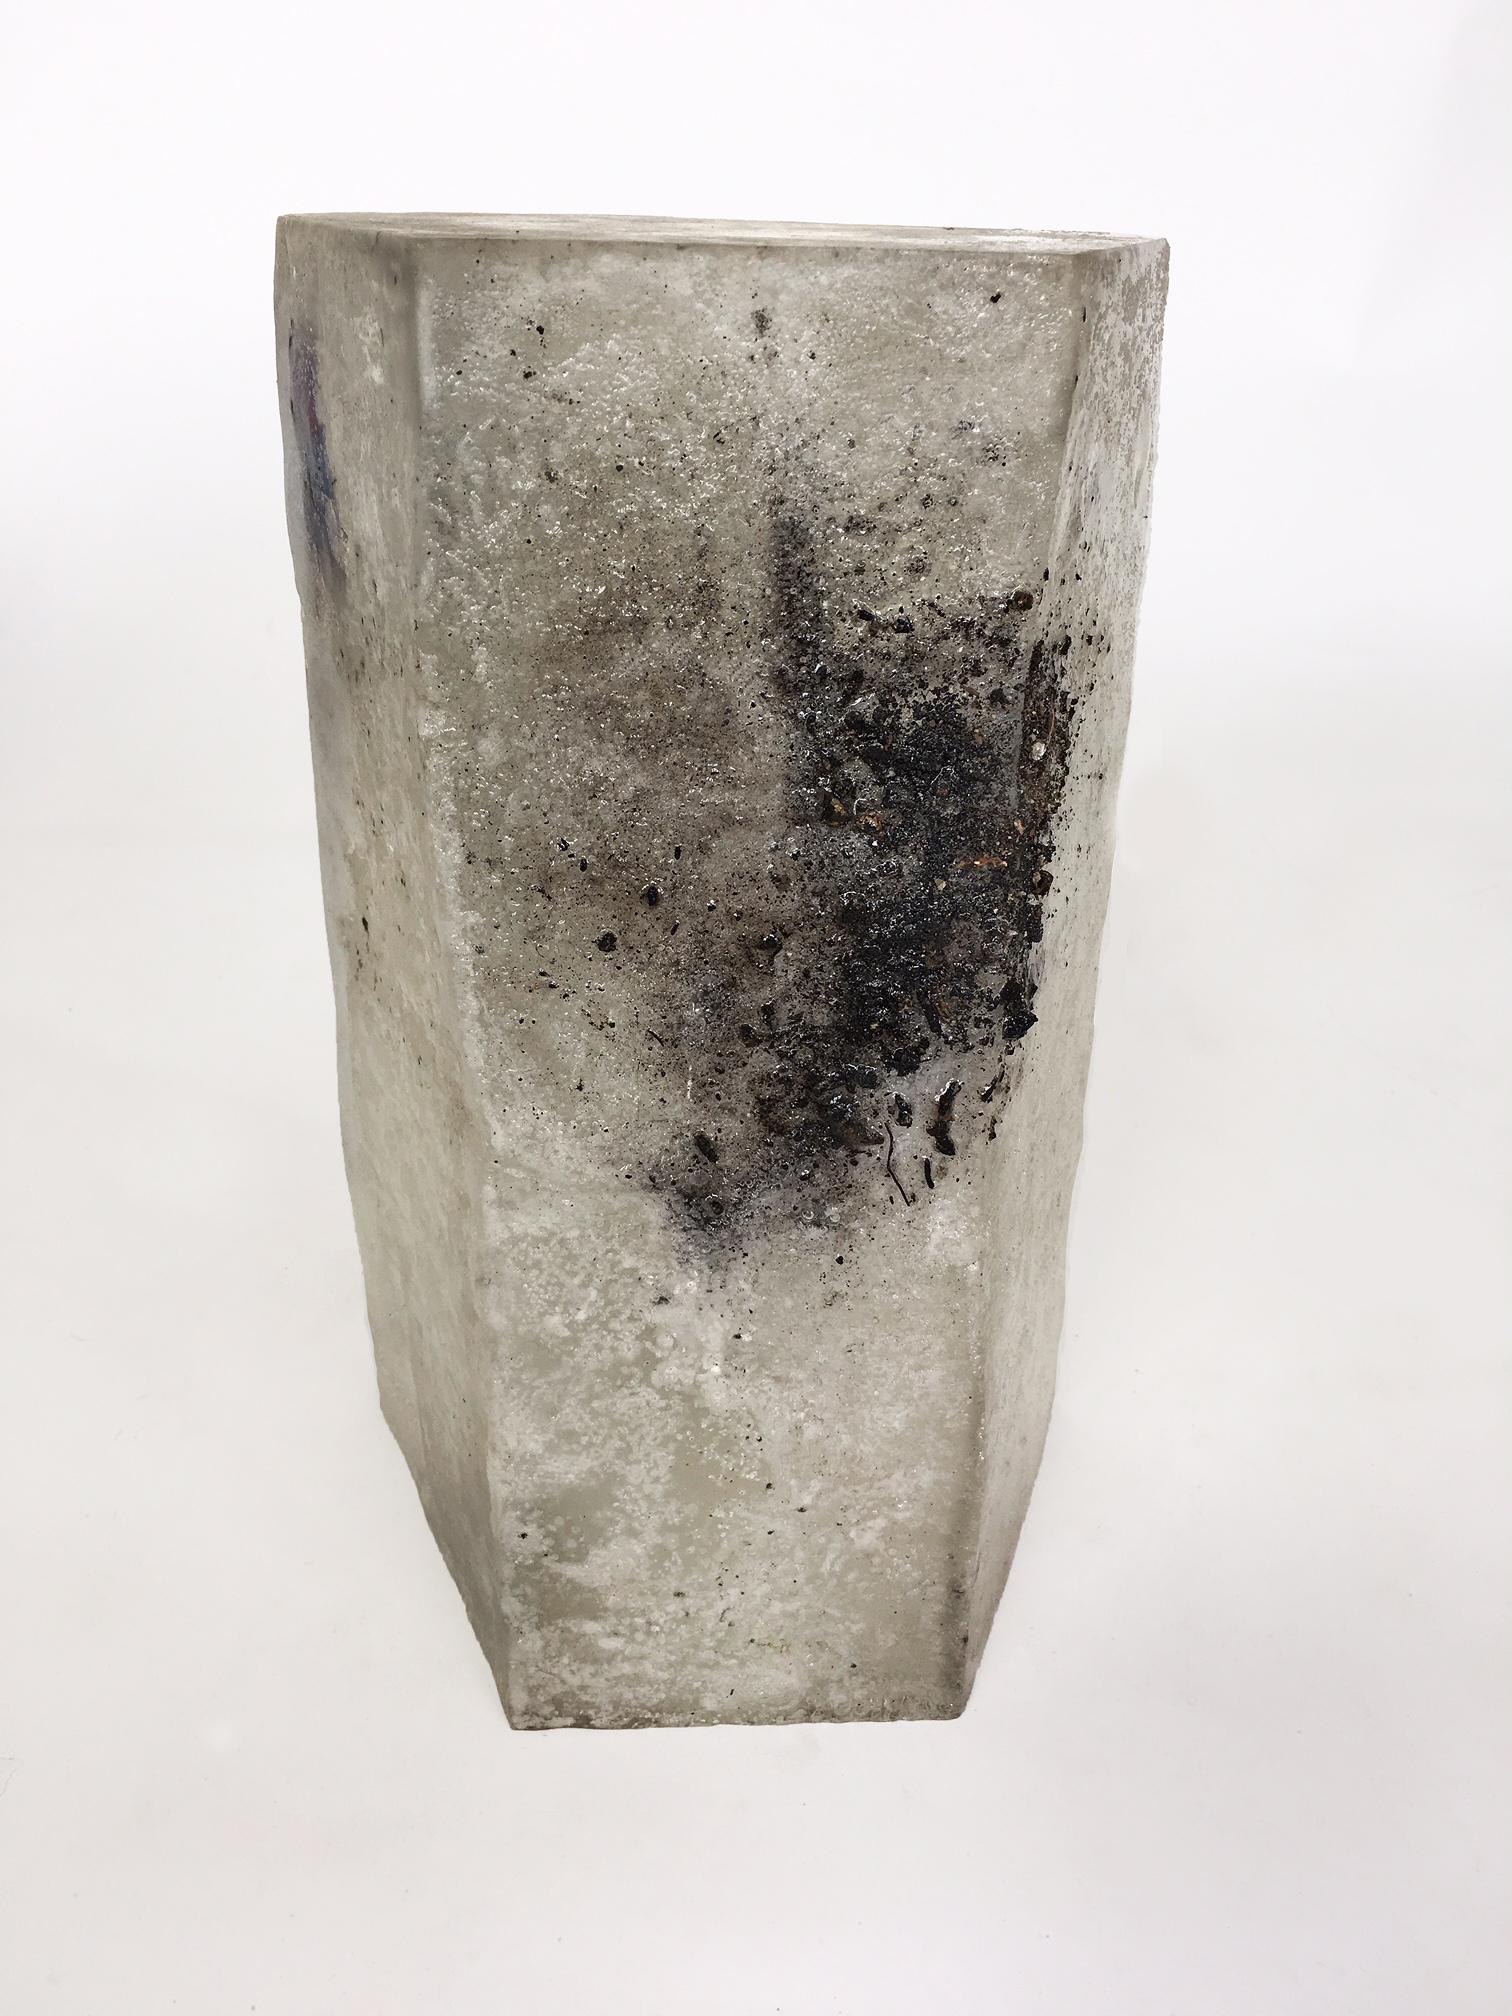 Fawn_Rogers_Fukushima_Soil_Meteorites_Hooker_Lipstick.jpg